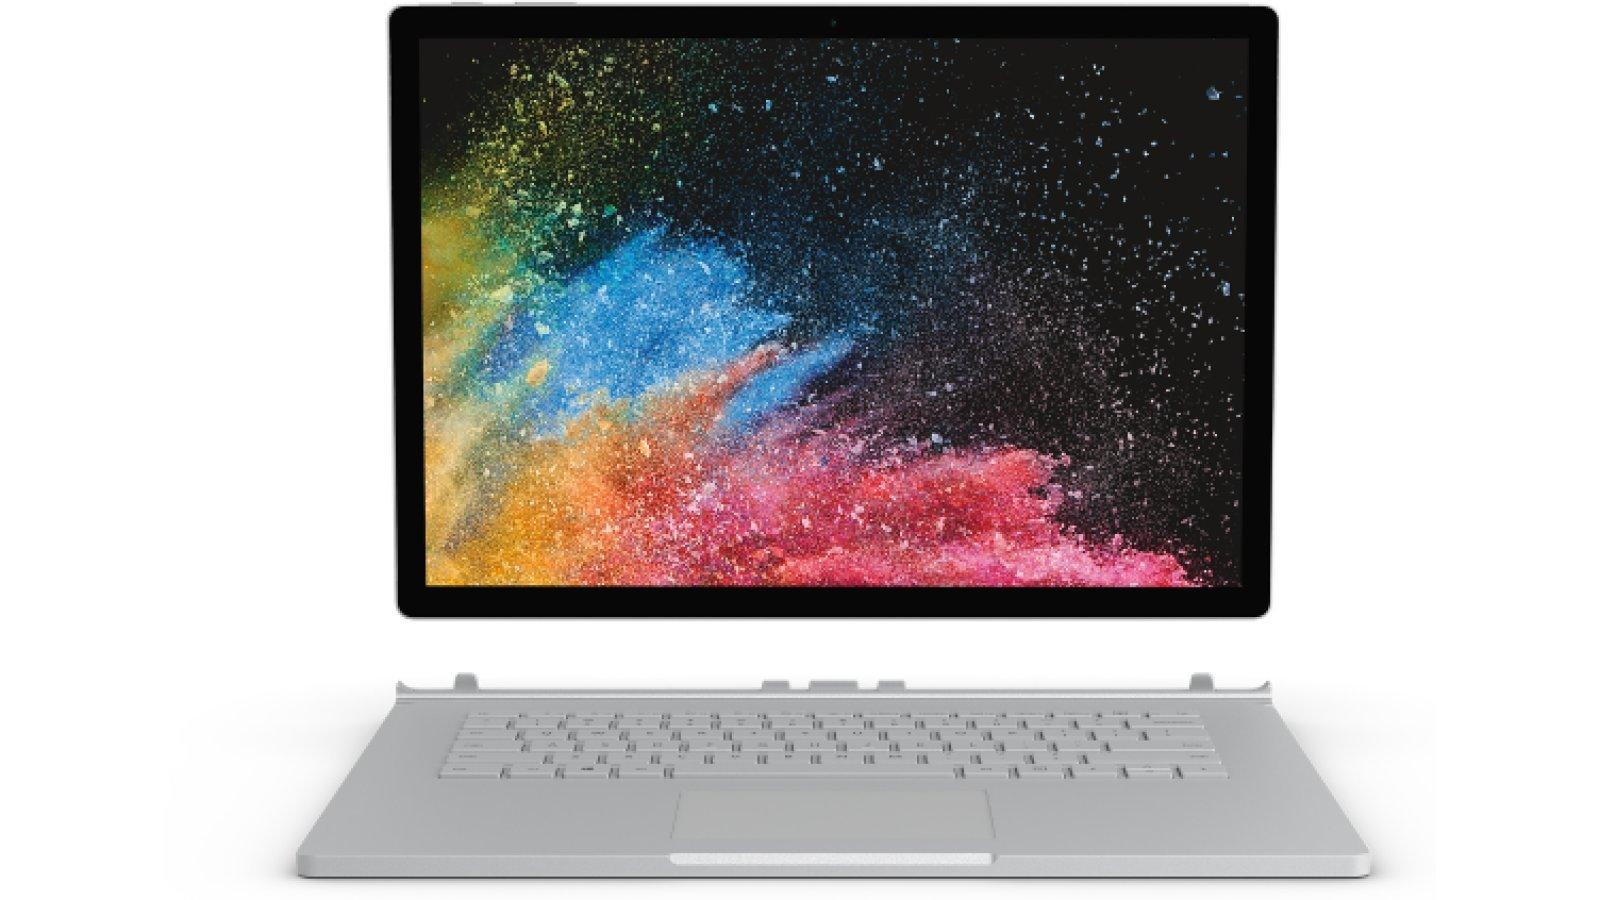 Microsoft обновила Surface Book 2 процессорами Intel 8-го поколения (dims 12)